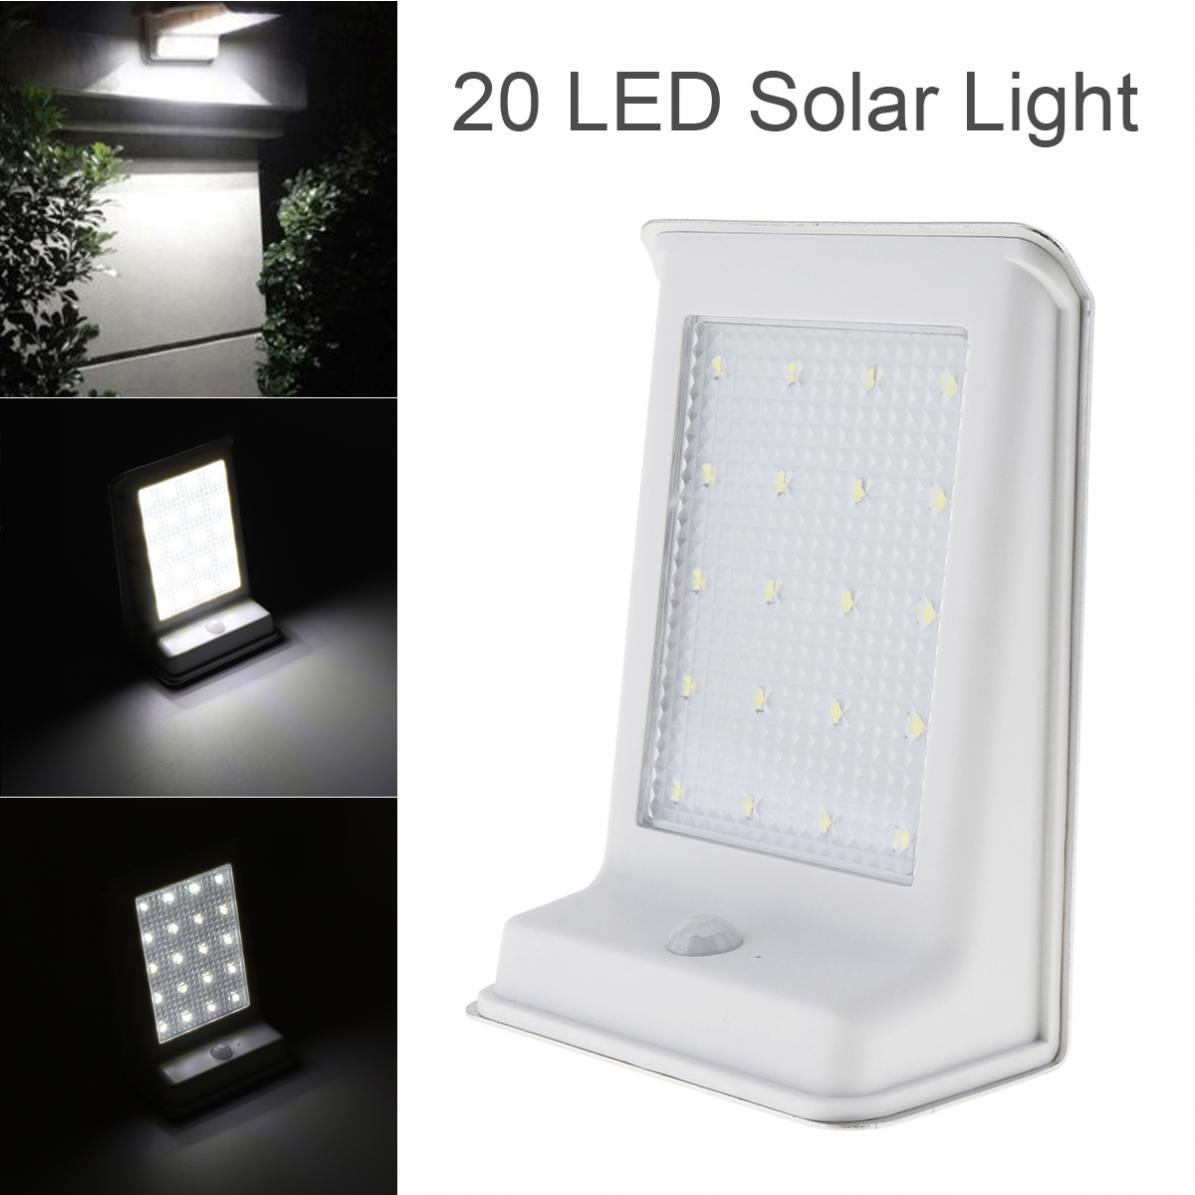 High Quality Waterproof 20 LED Solar Power Outdoor Security Light Lamp PIR Motion Sensor